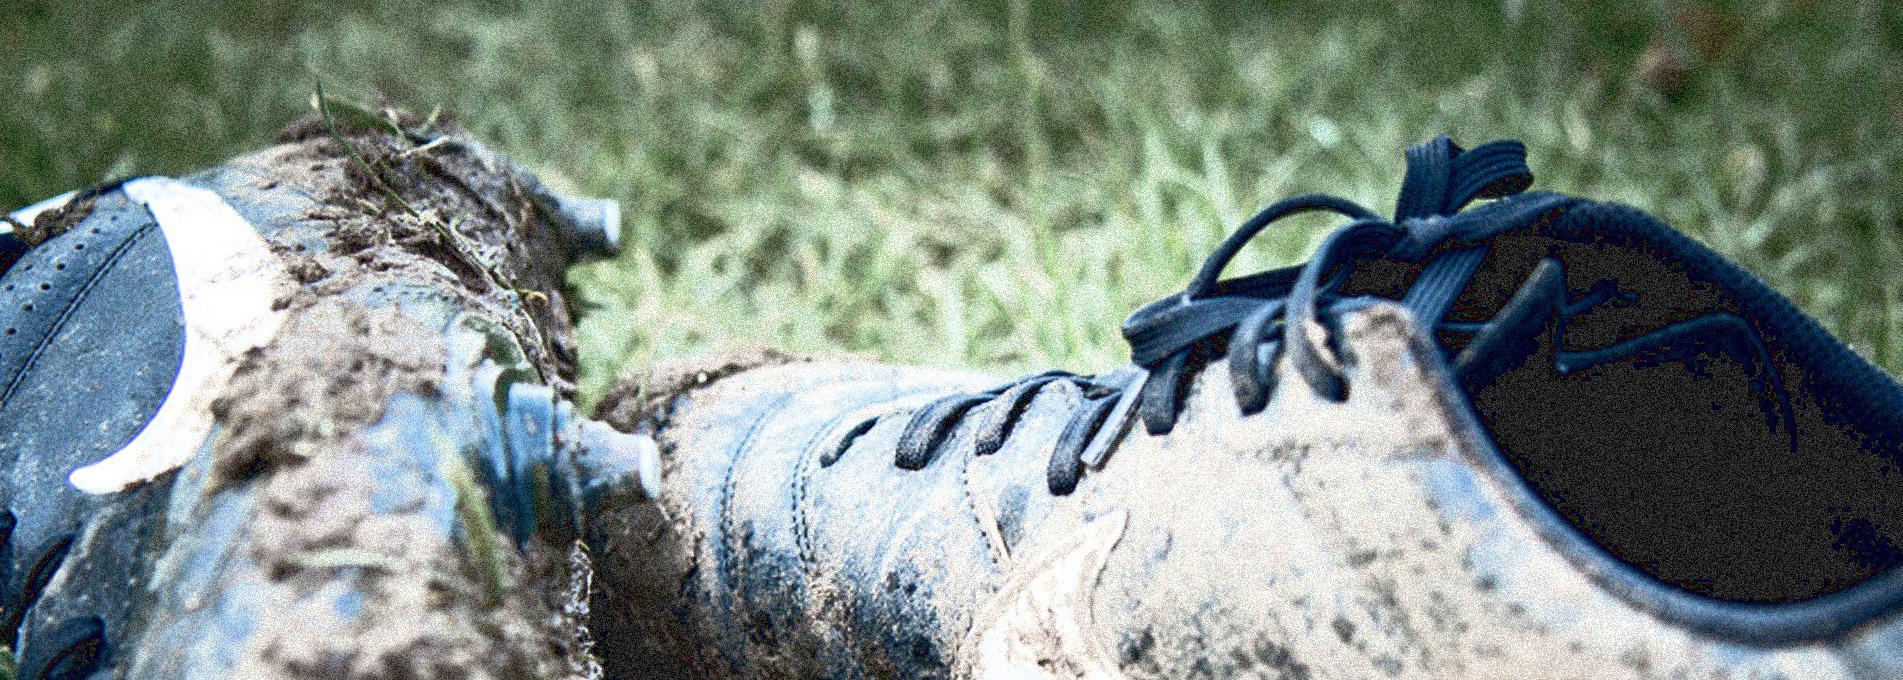 0c1a6bb426a Η μαχη των παπουτσιών - AthleteStories